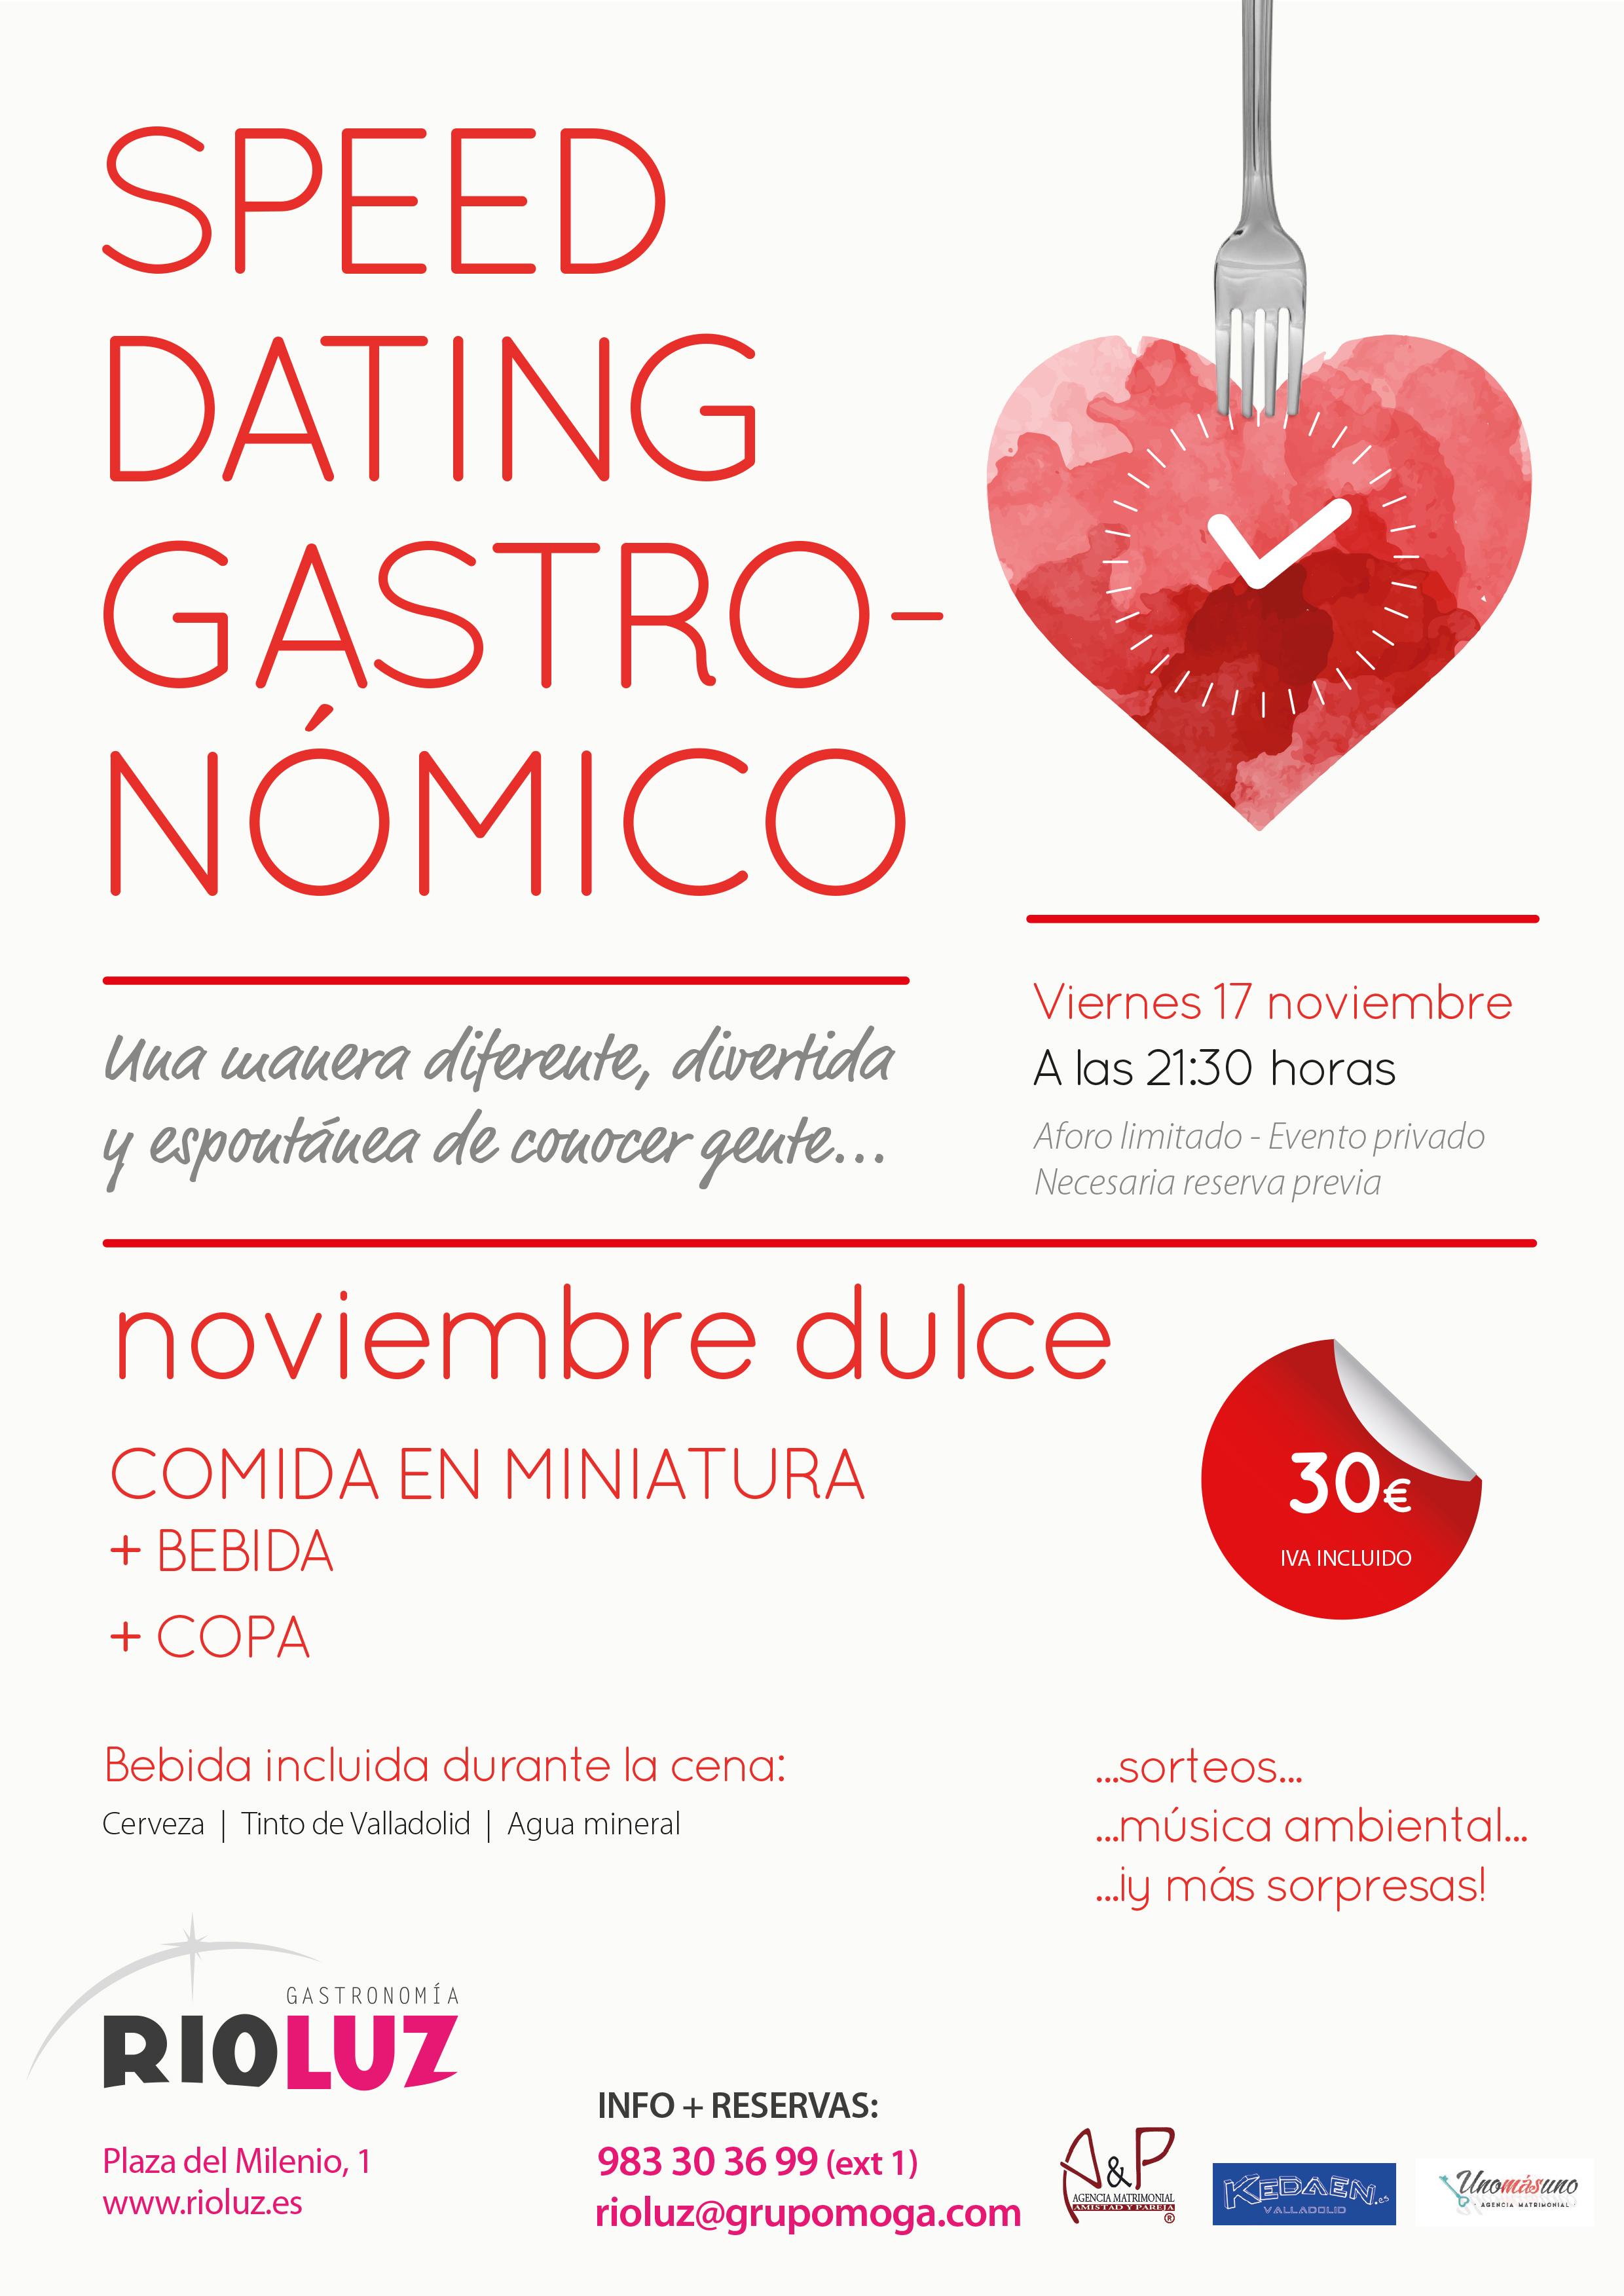 free phillipino dating sites